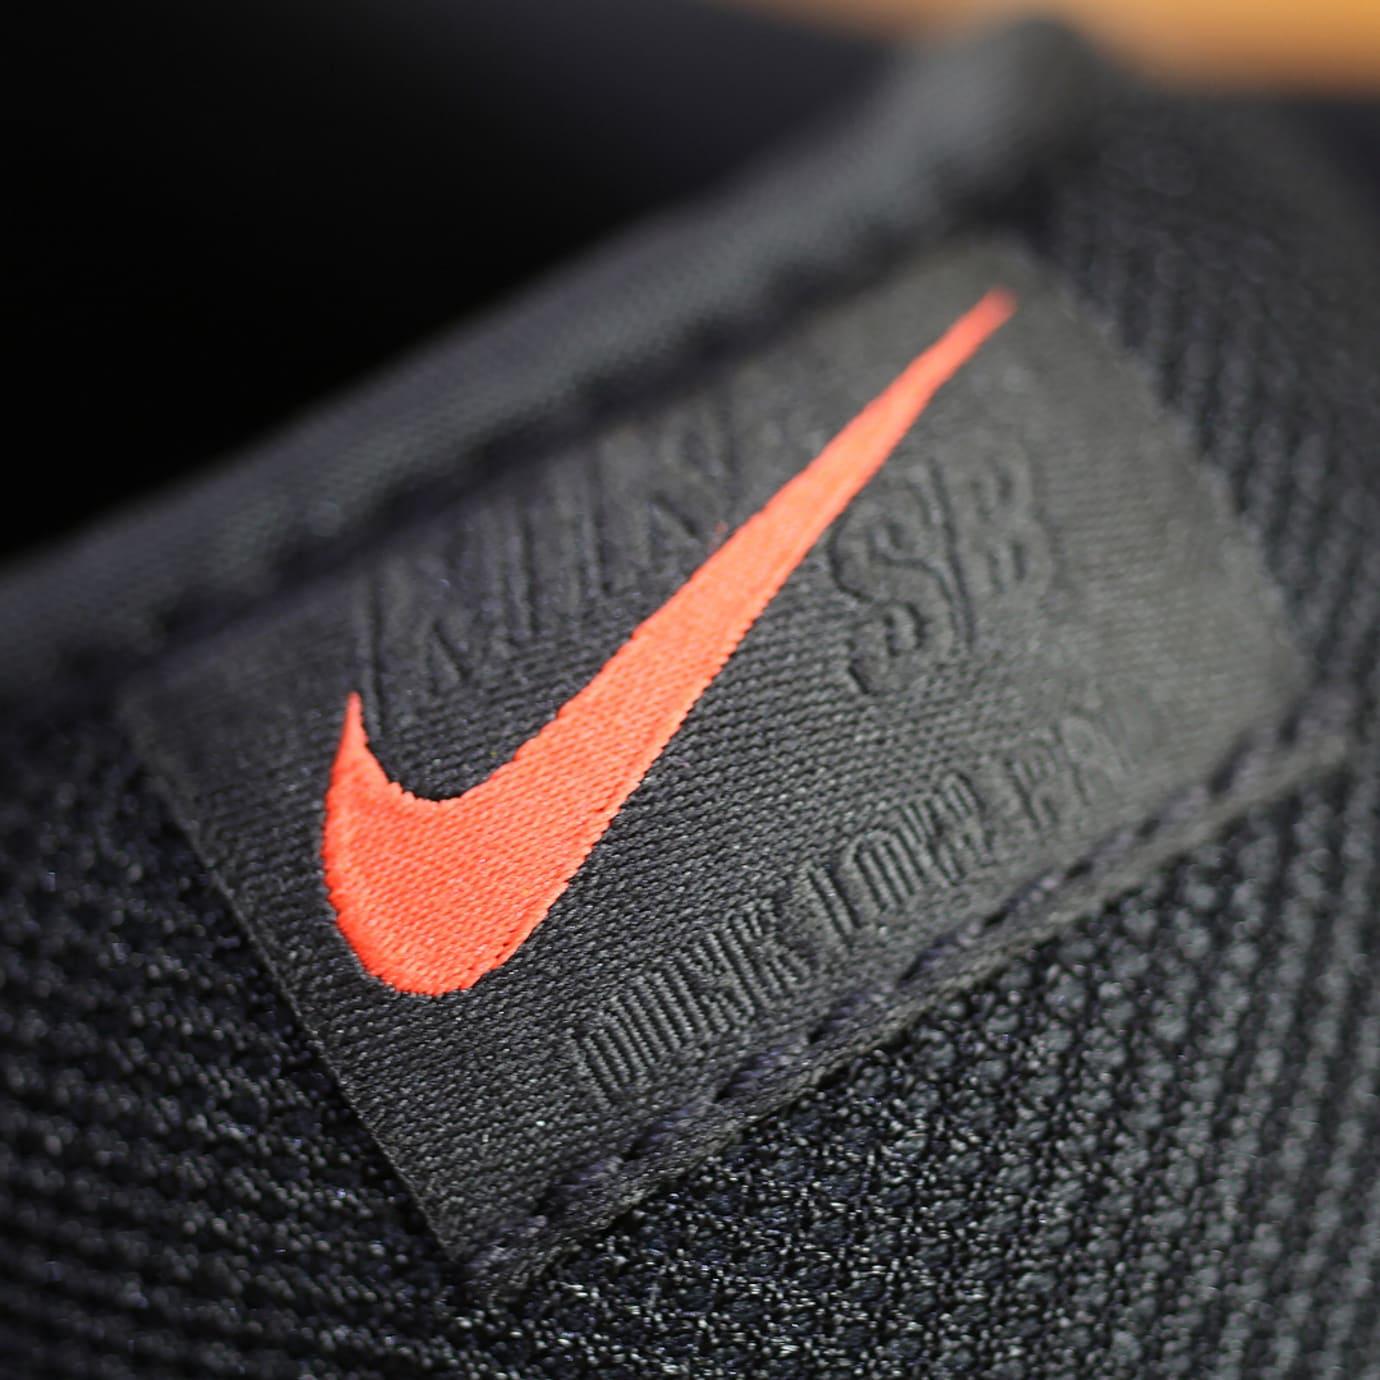 Nike SB Dunk Low Black Pigeon Release Date 88323-008 (11)